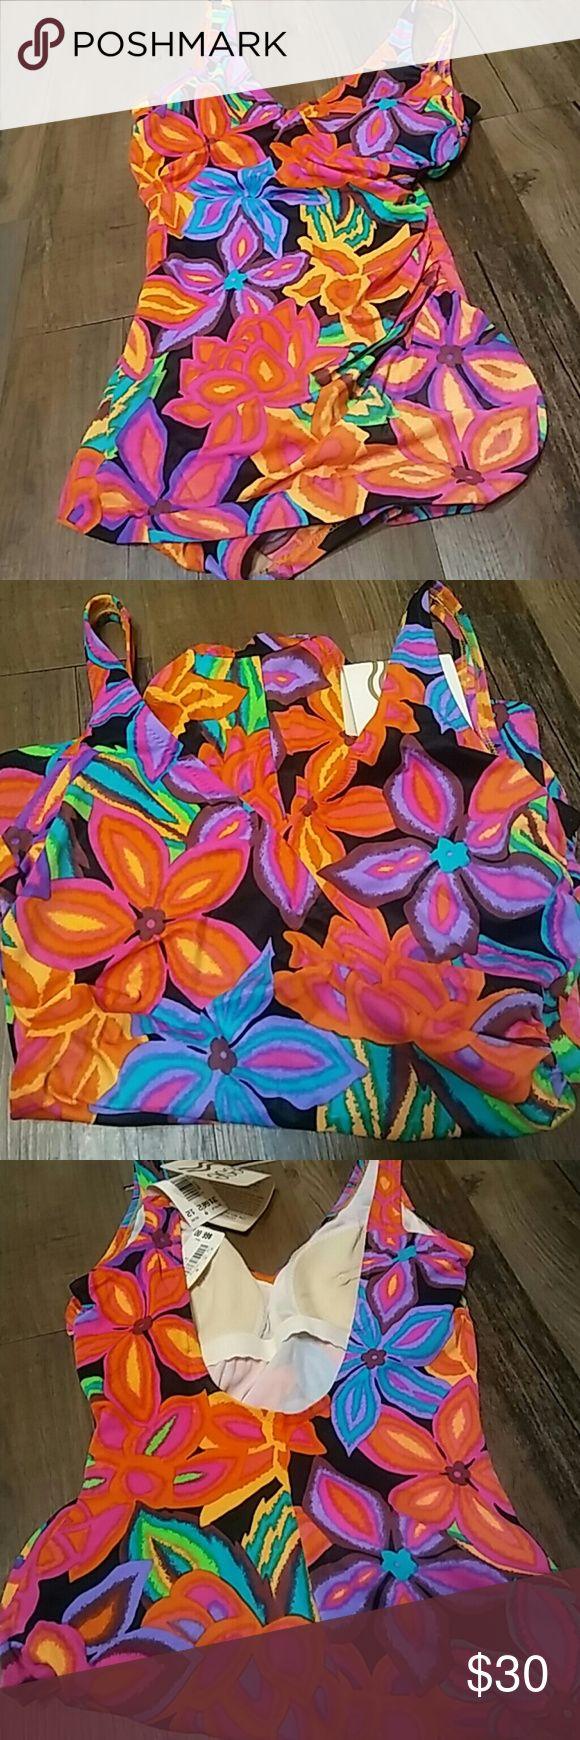 Dillard's Deweese multi color swimsuit Dillard's Deweese multi color swimsuit  Size 12  Style 31662  85% nylon 15% Spandex (34 Bra) Swim One Pieces